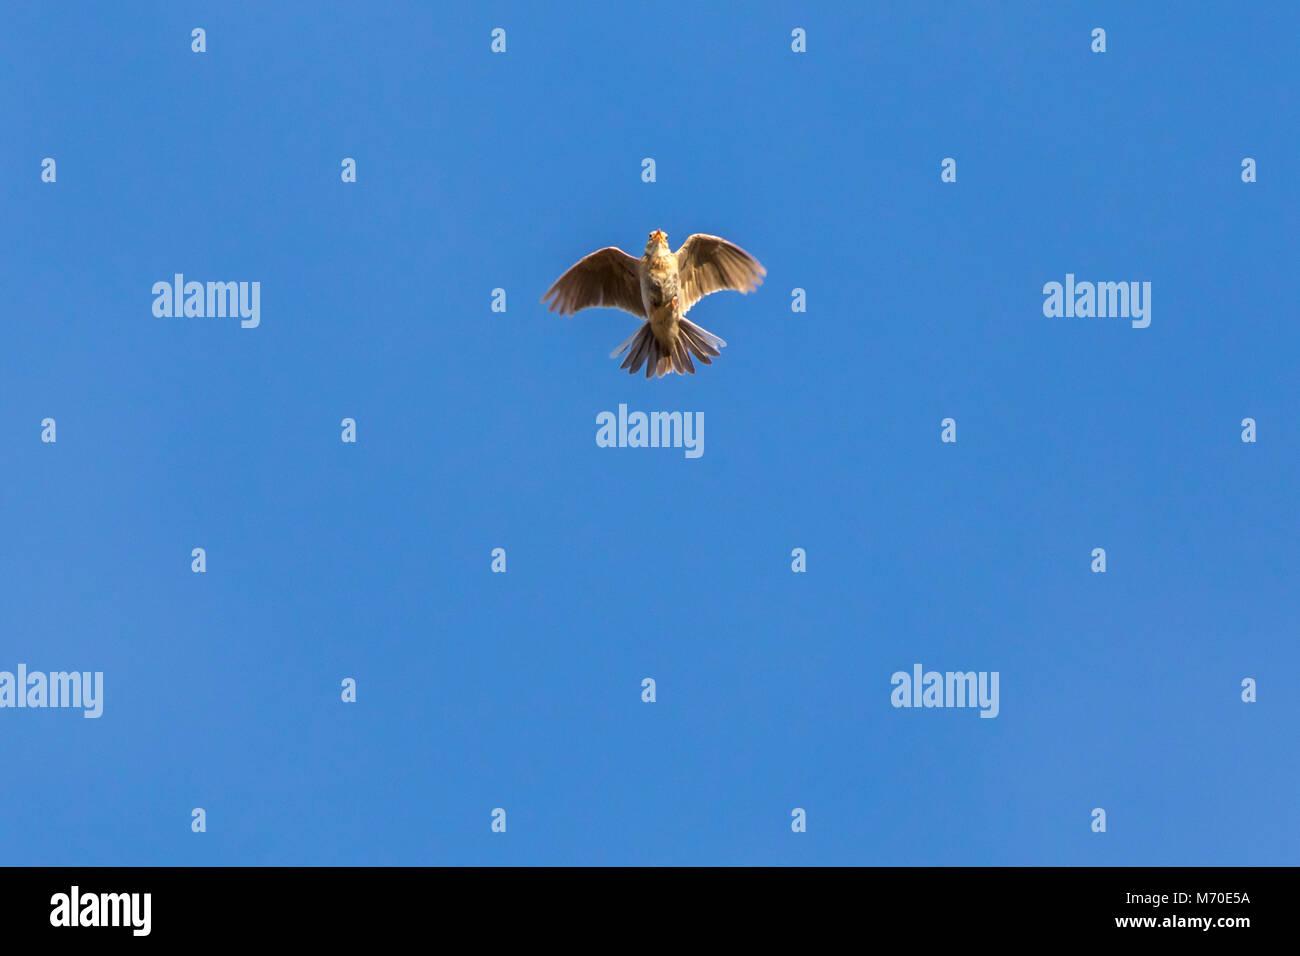 A common skylark in flight - Stock Image